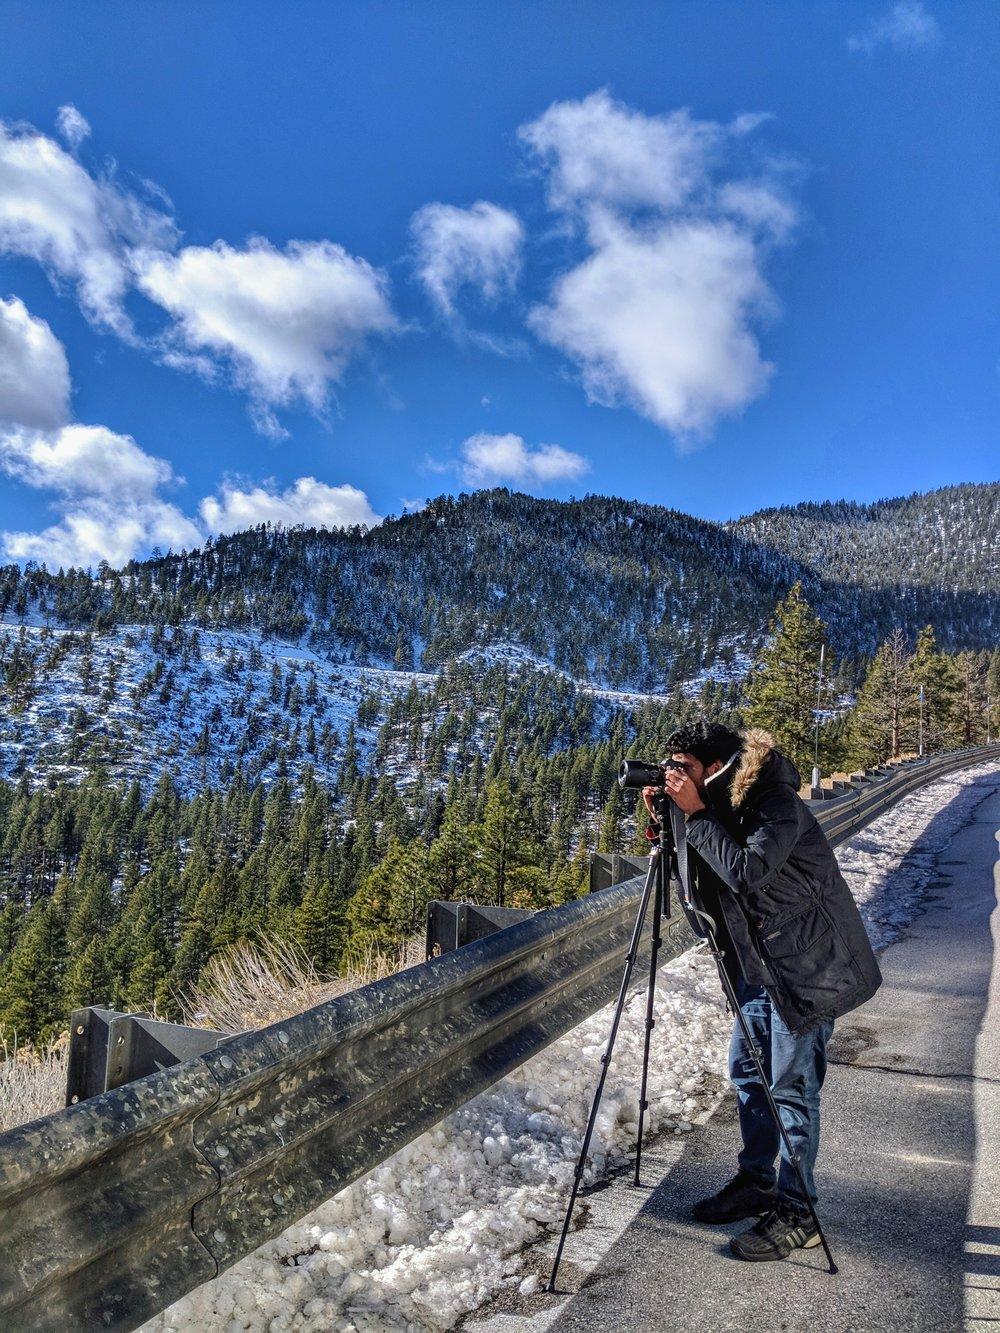 Shakir capturing one of the many breathtaking views around every corner!